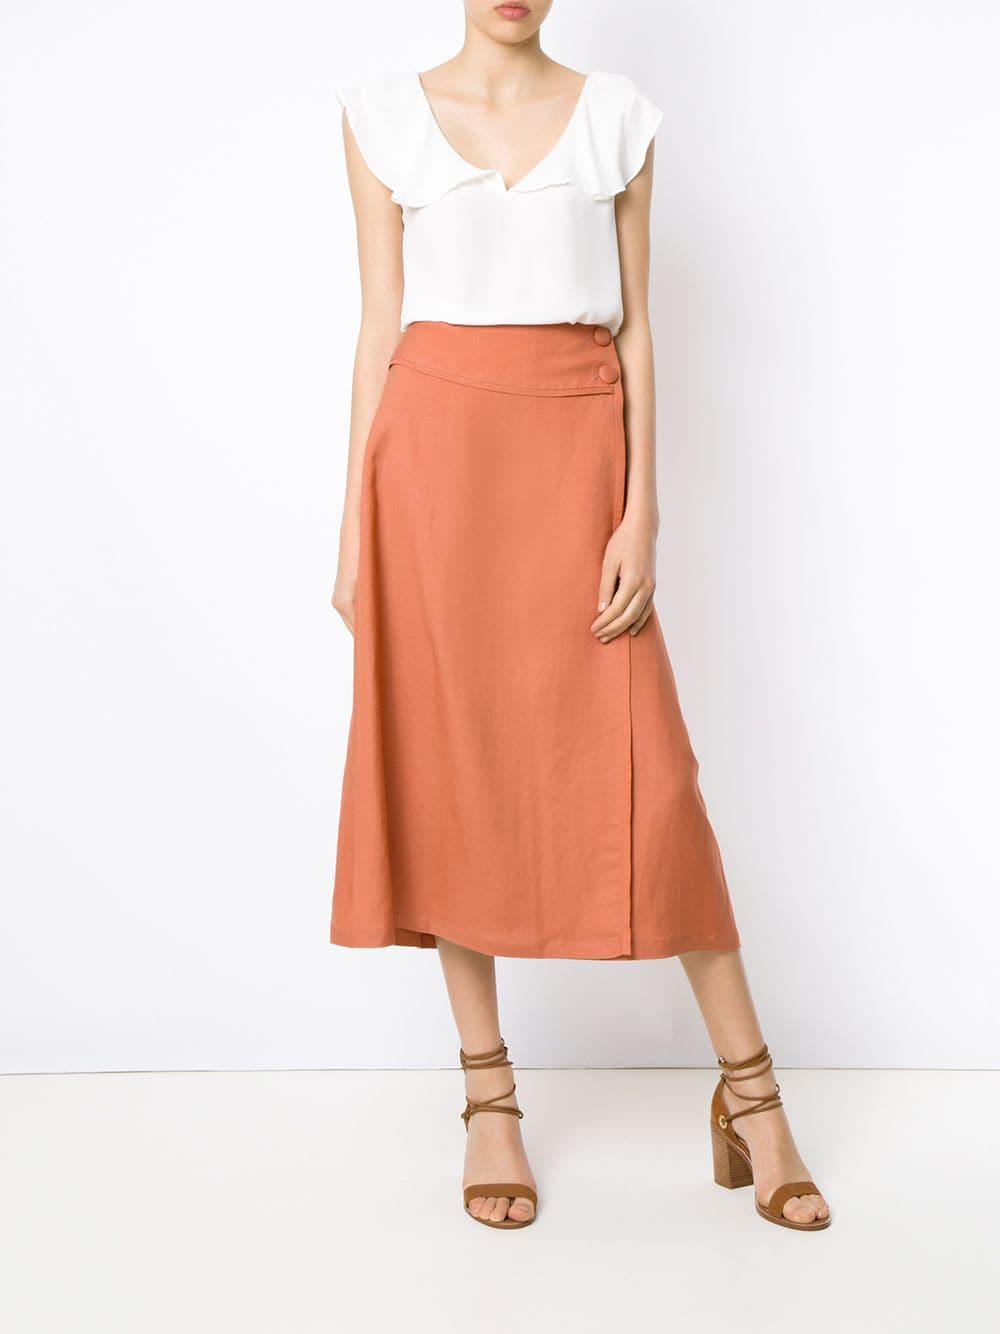 b756a2c47 Lyst - Adriana Degreas Midi Skirt in Yellow